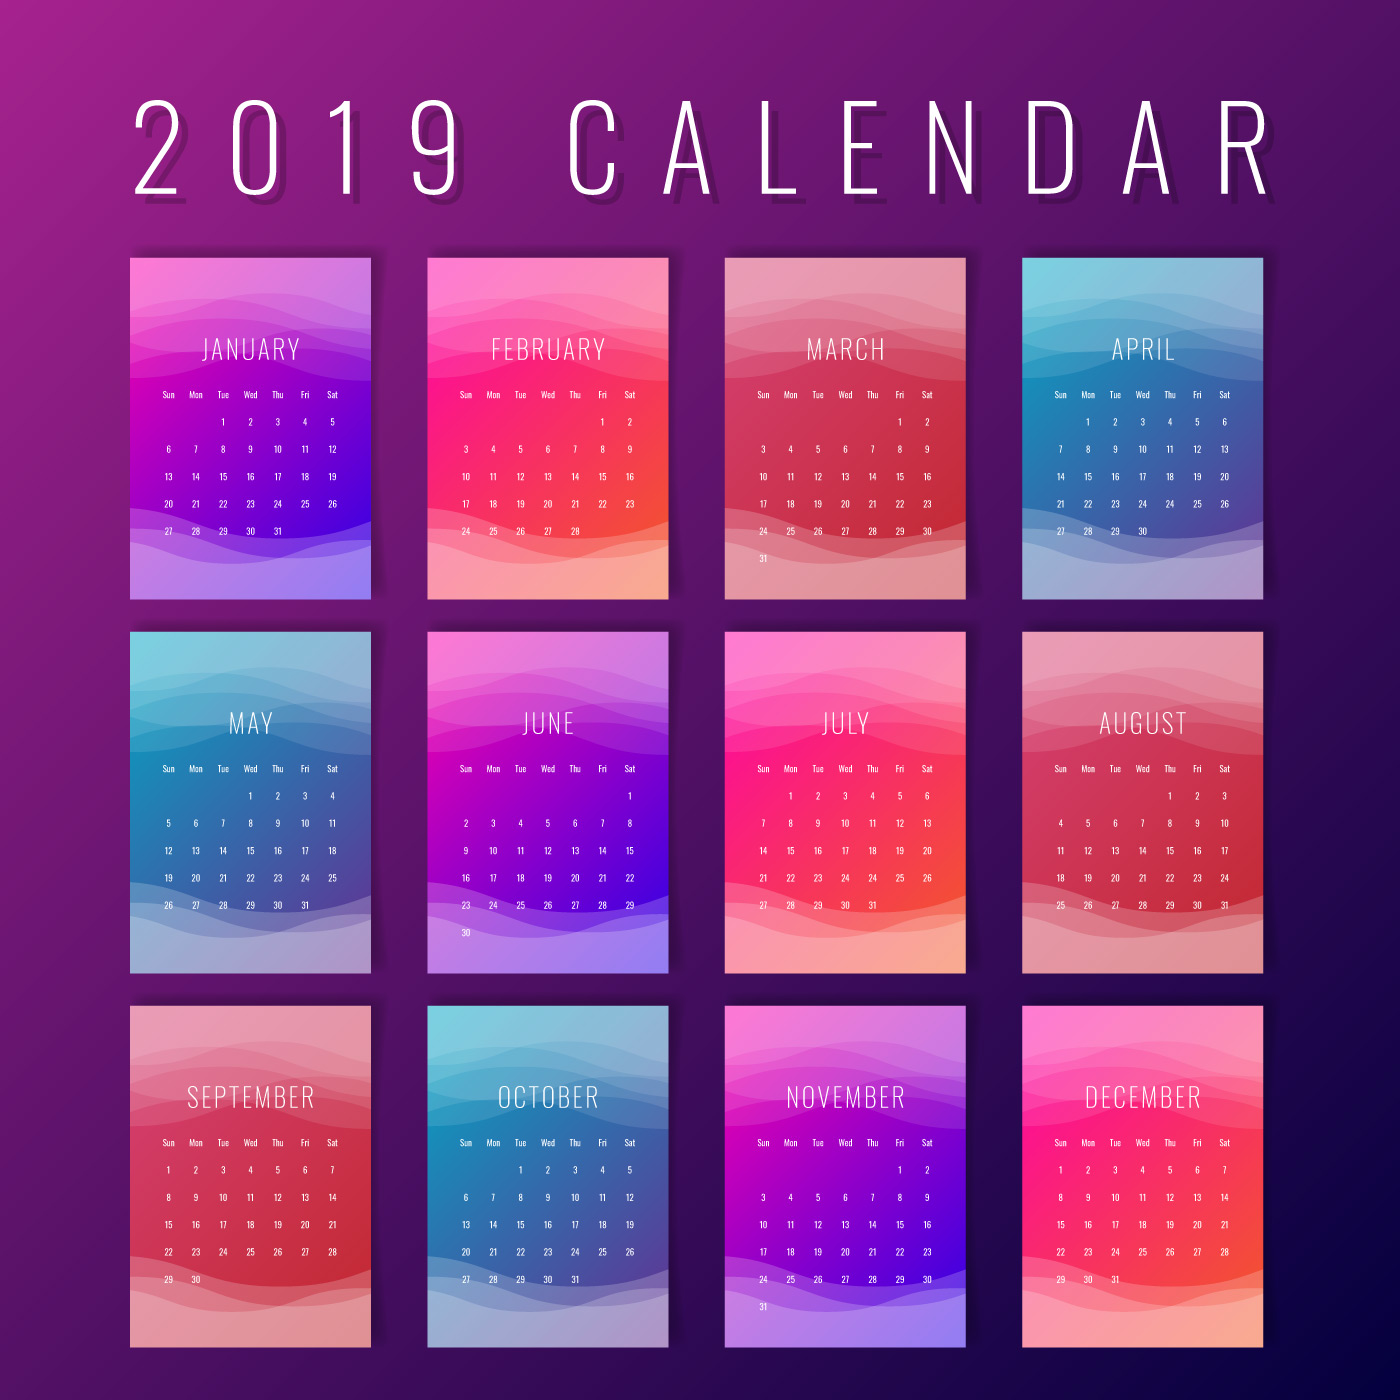 Calendar 2019 Colorful Printable Creative Templates ...